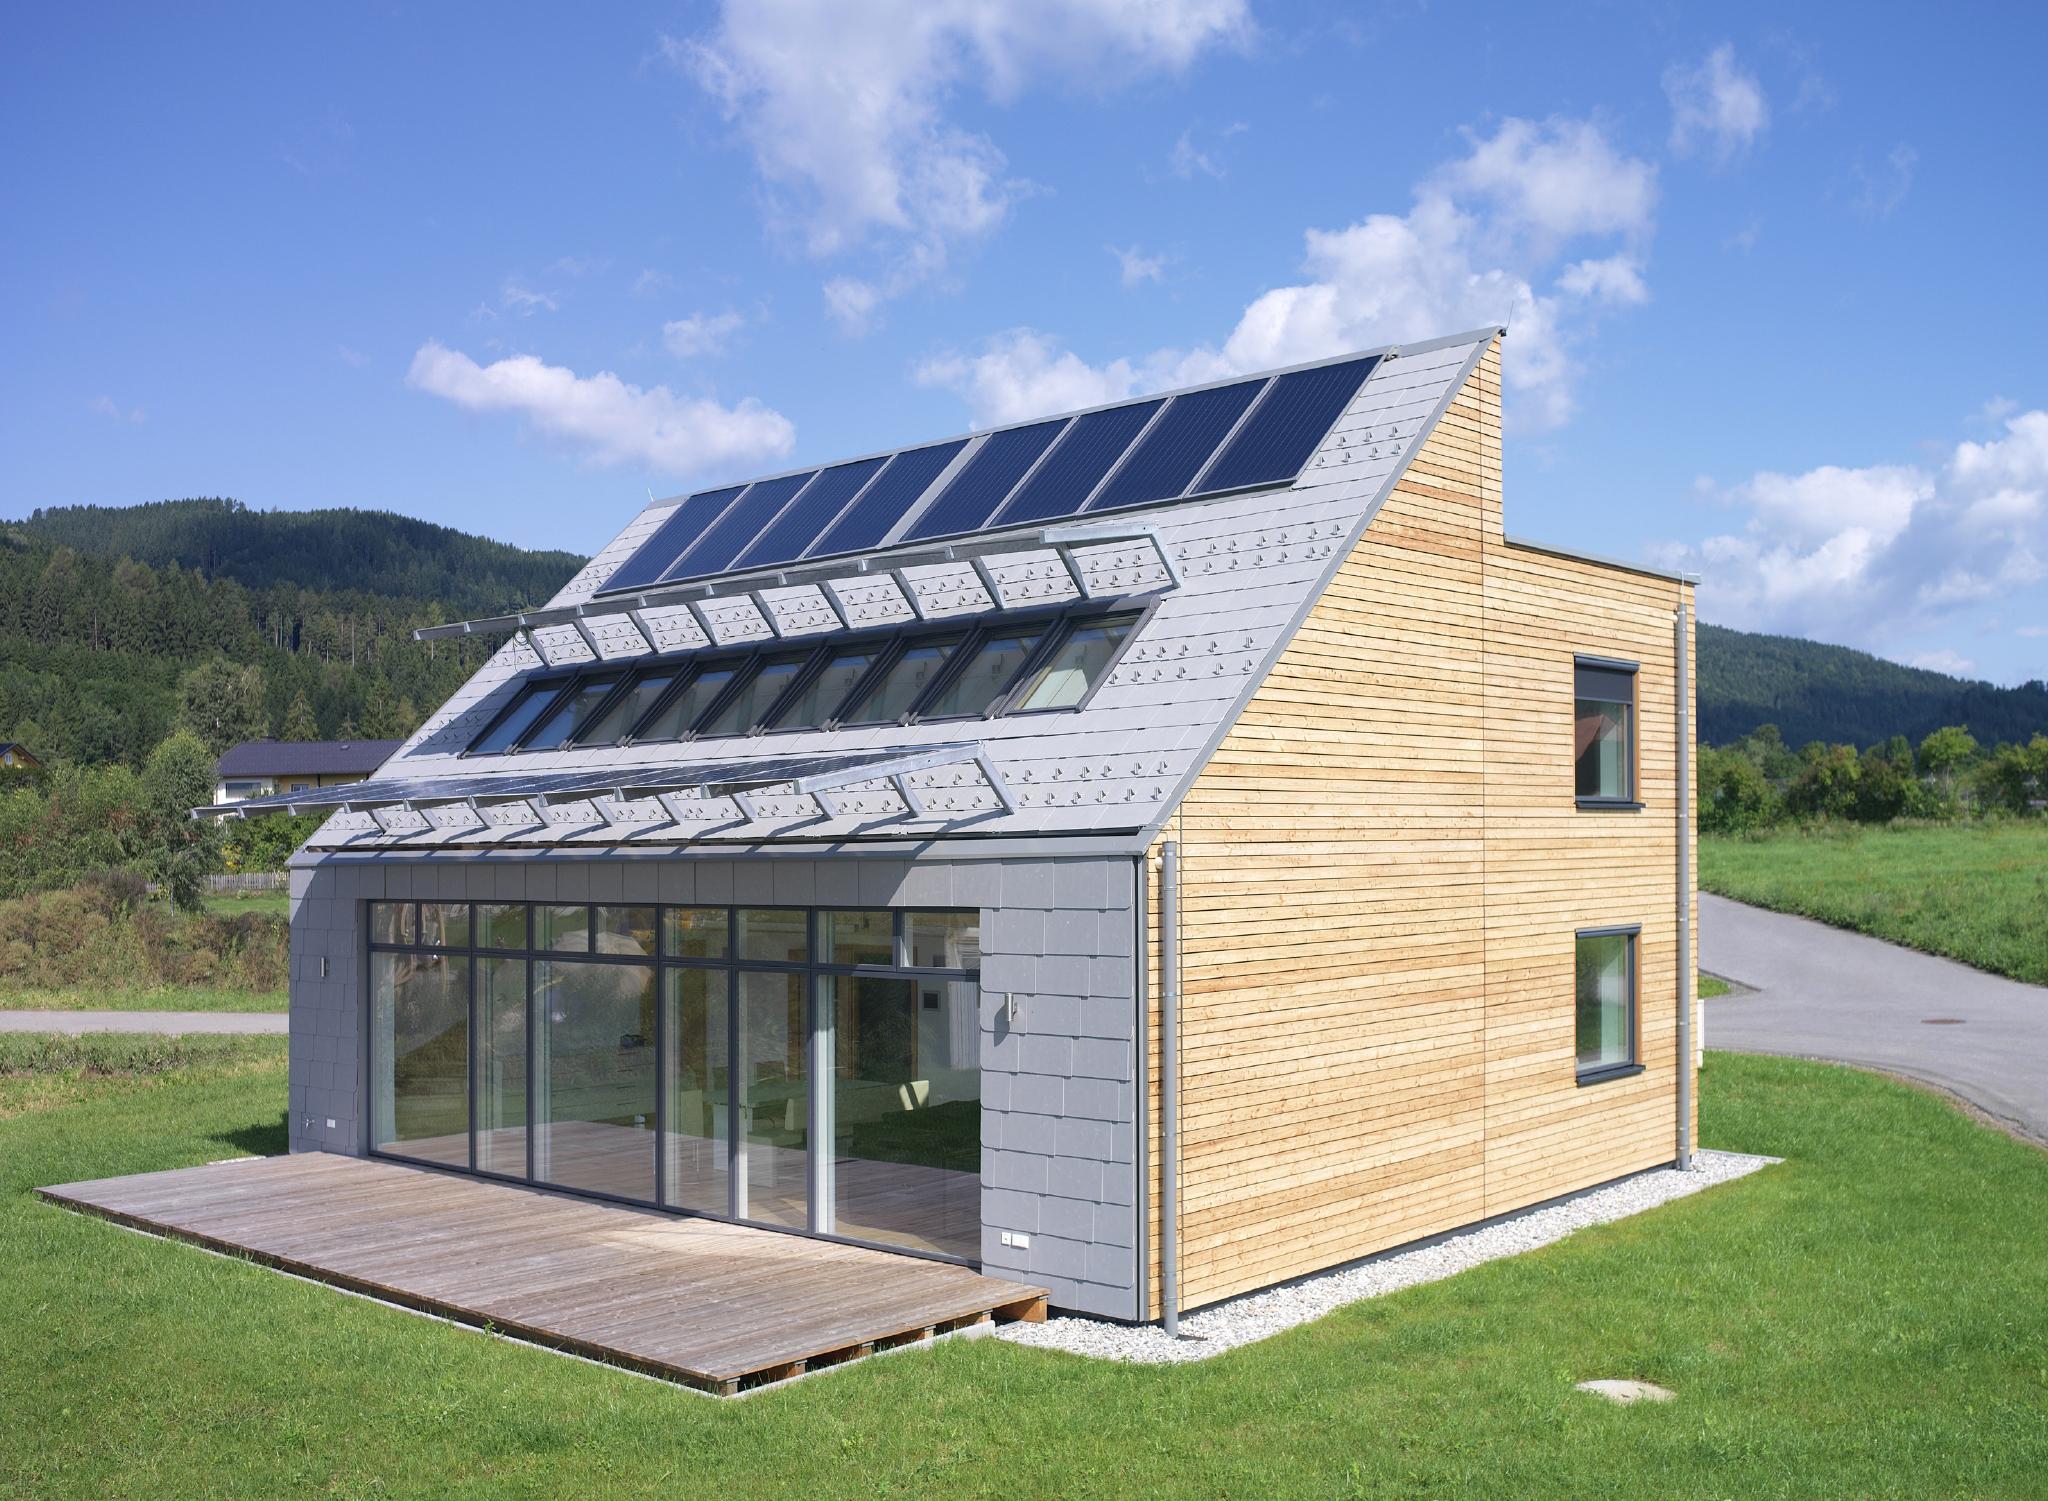 Solar Panel System Architecture